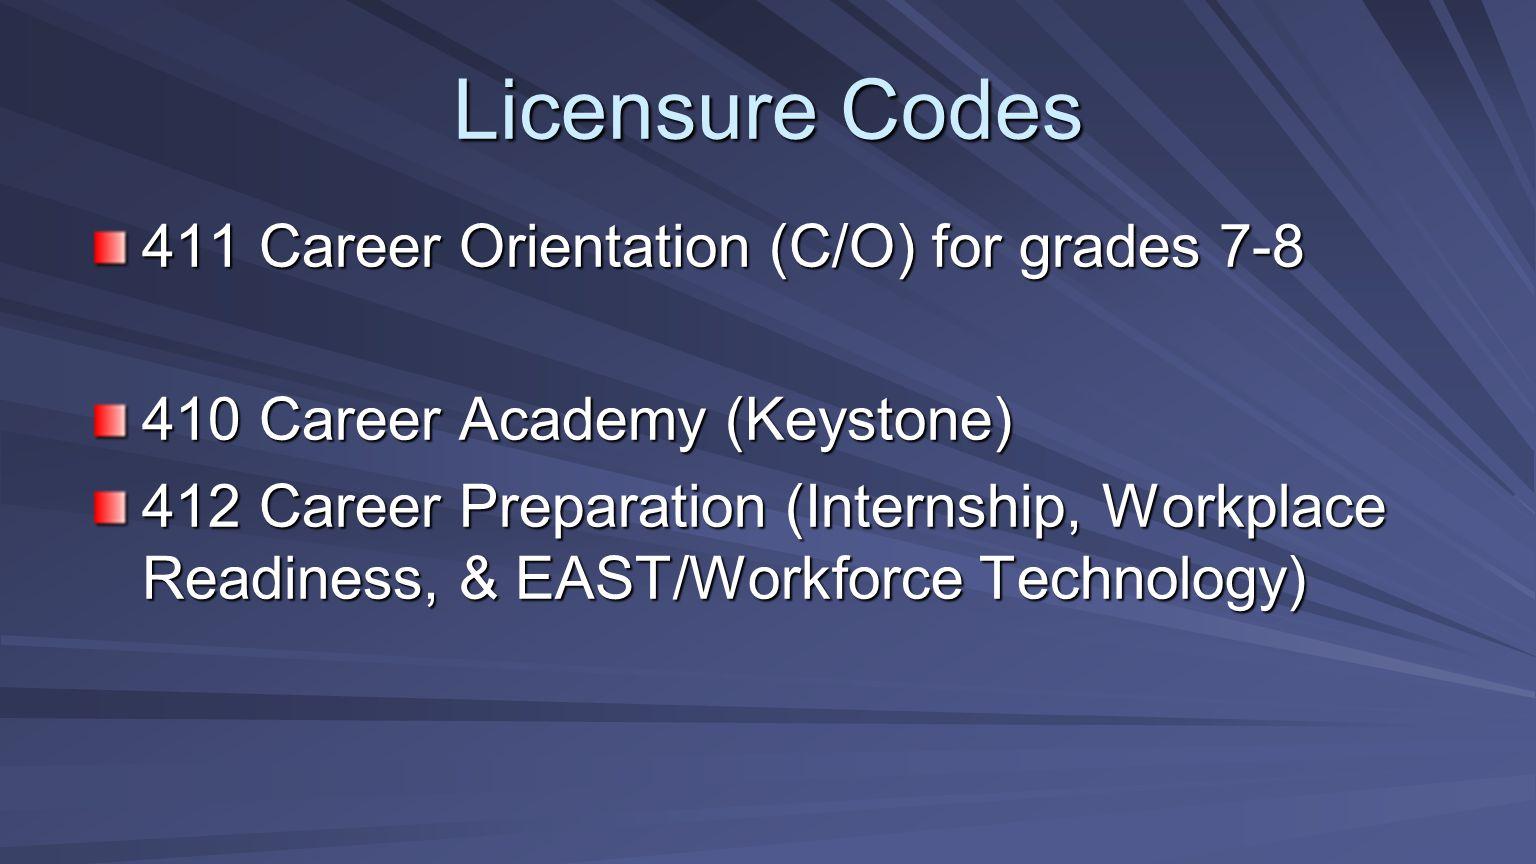 Licensure Codes 411 Career Orientation (C/O) for grades 7-8